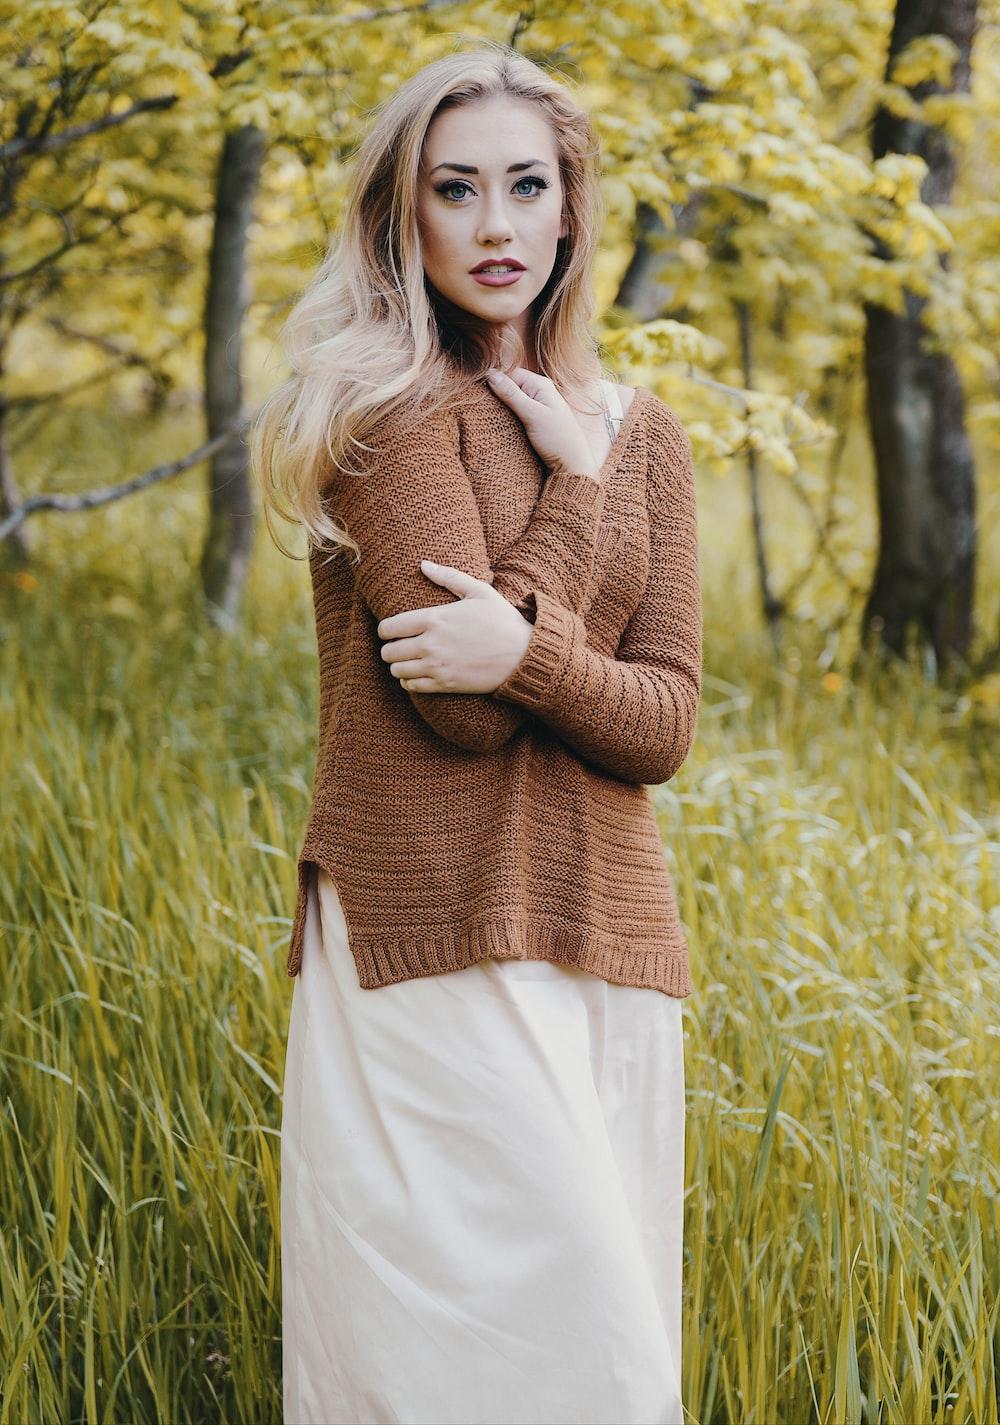 woman wearing brown sweater standing on green grass field